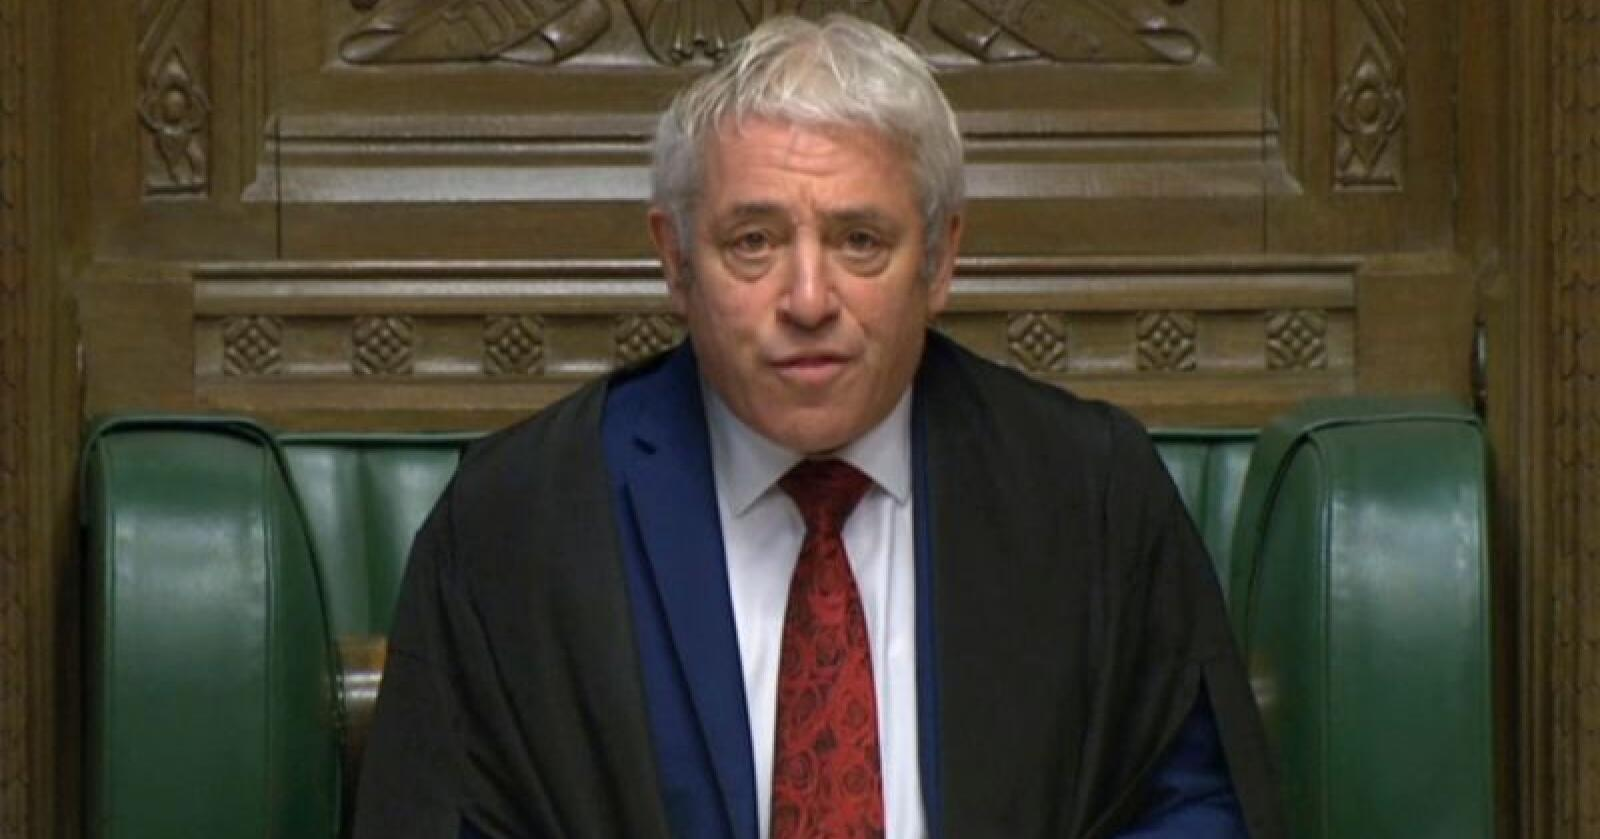 Underhusets leder John Bercow. Foto: House of Commons / AP / NTB scanpix